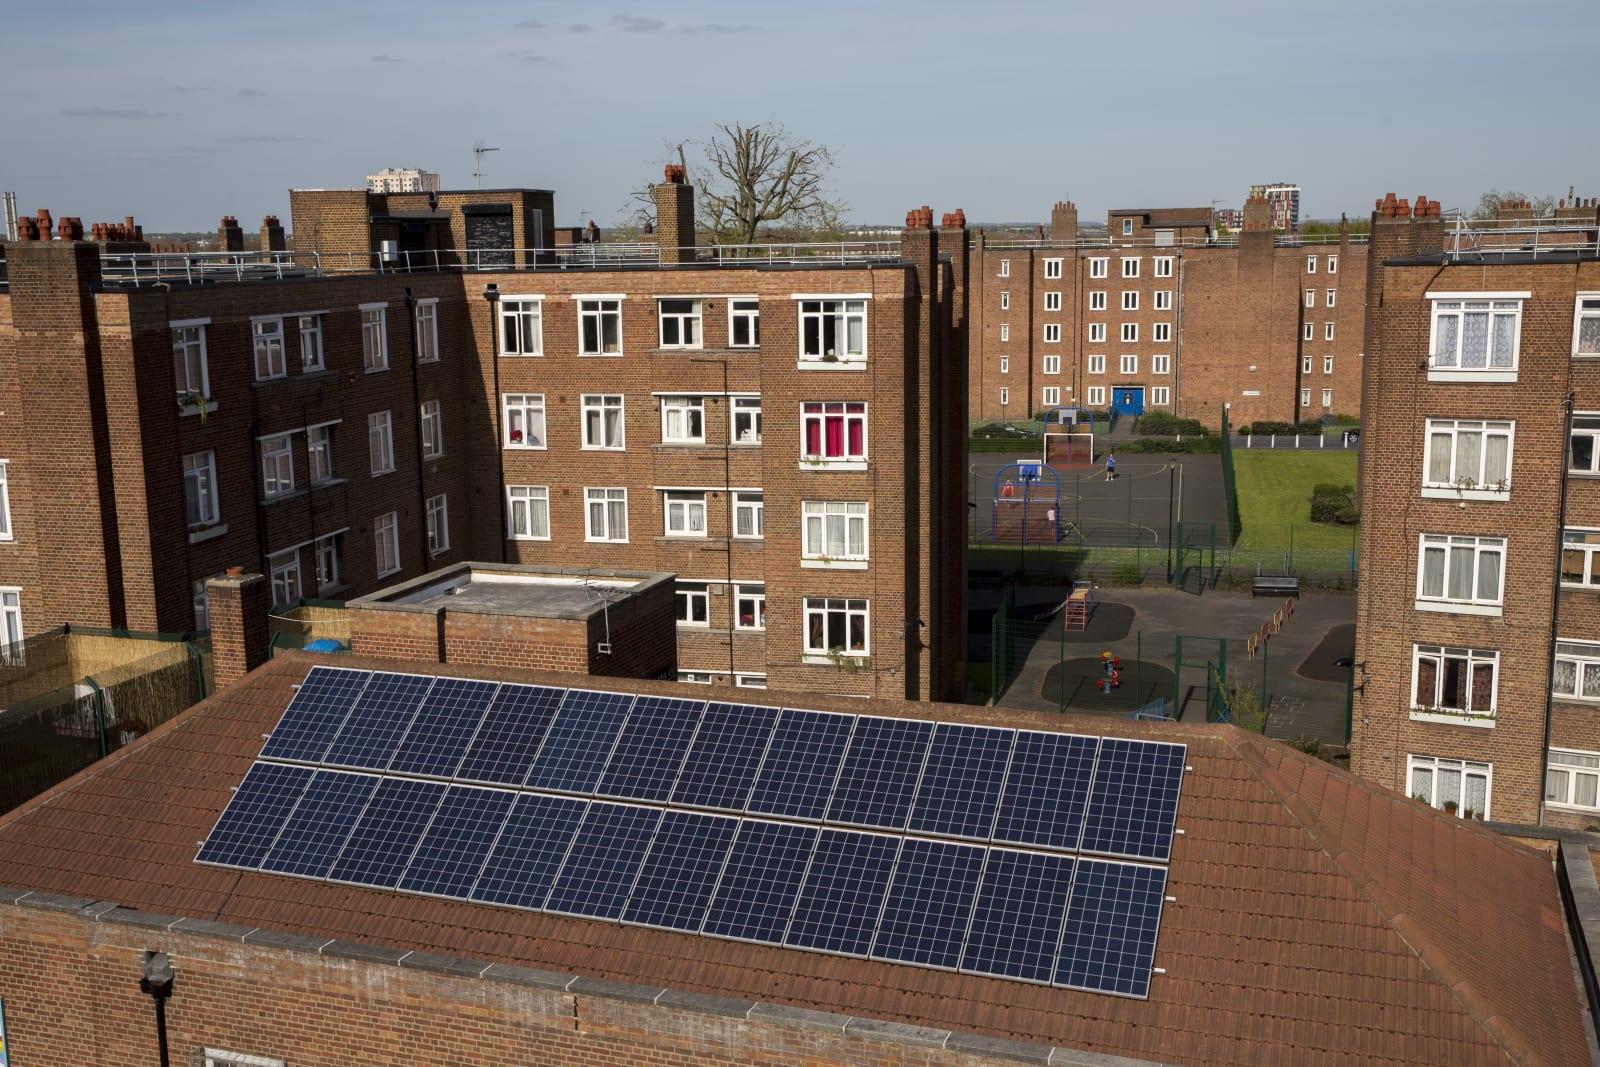 power sc olympicsun electric gallery solar panels jacuzzi bwg vineyard mitsubishi